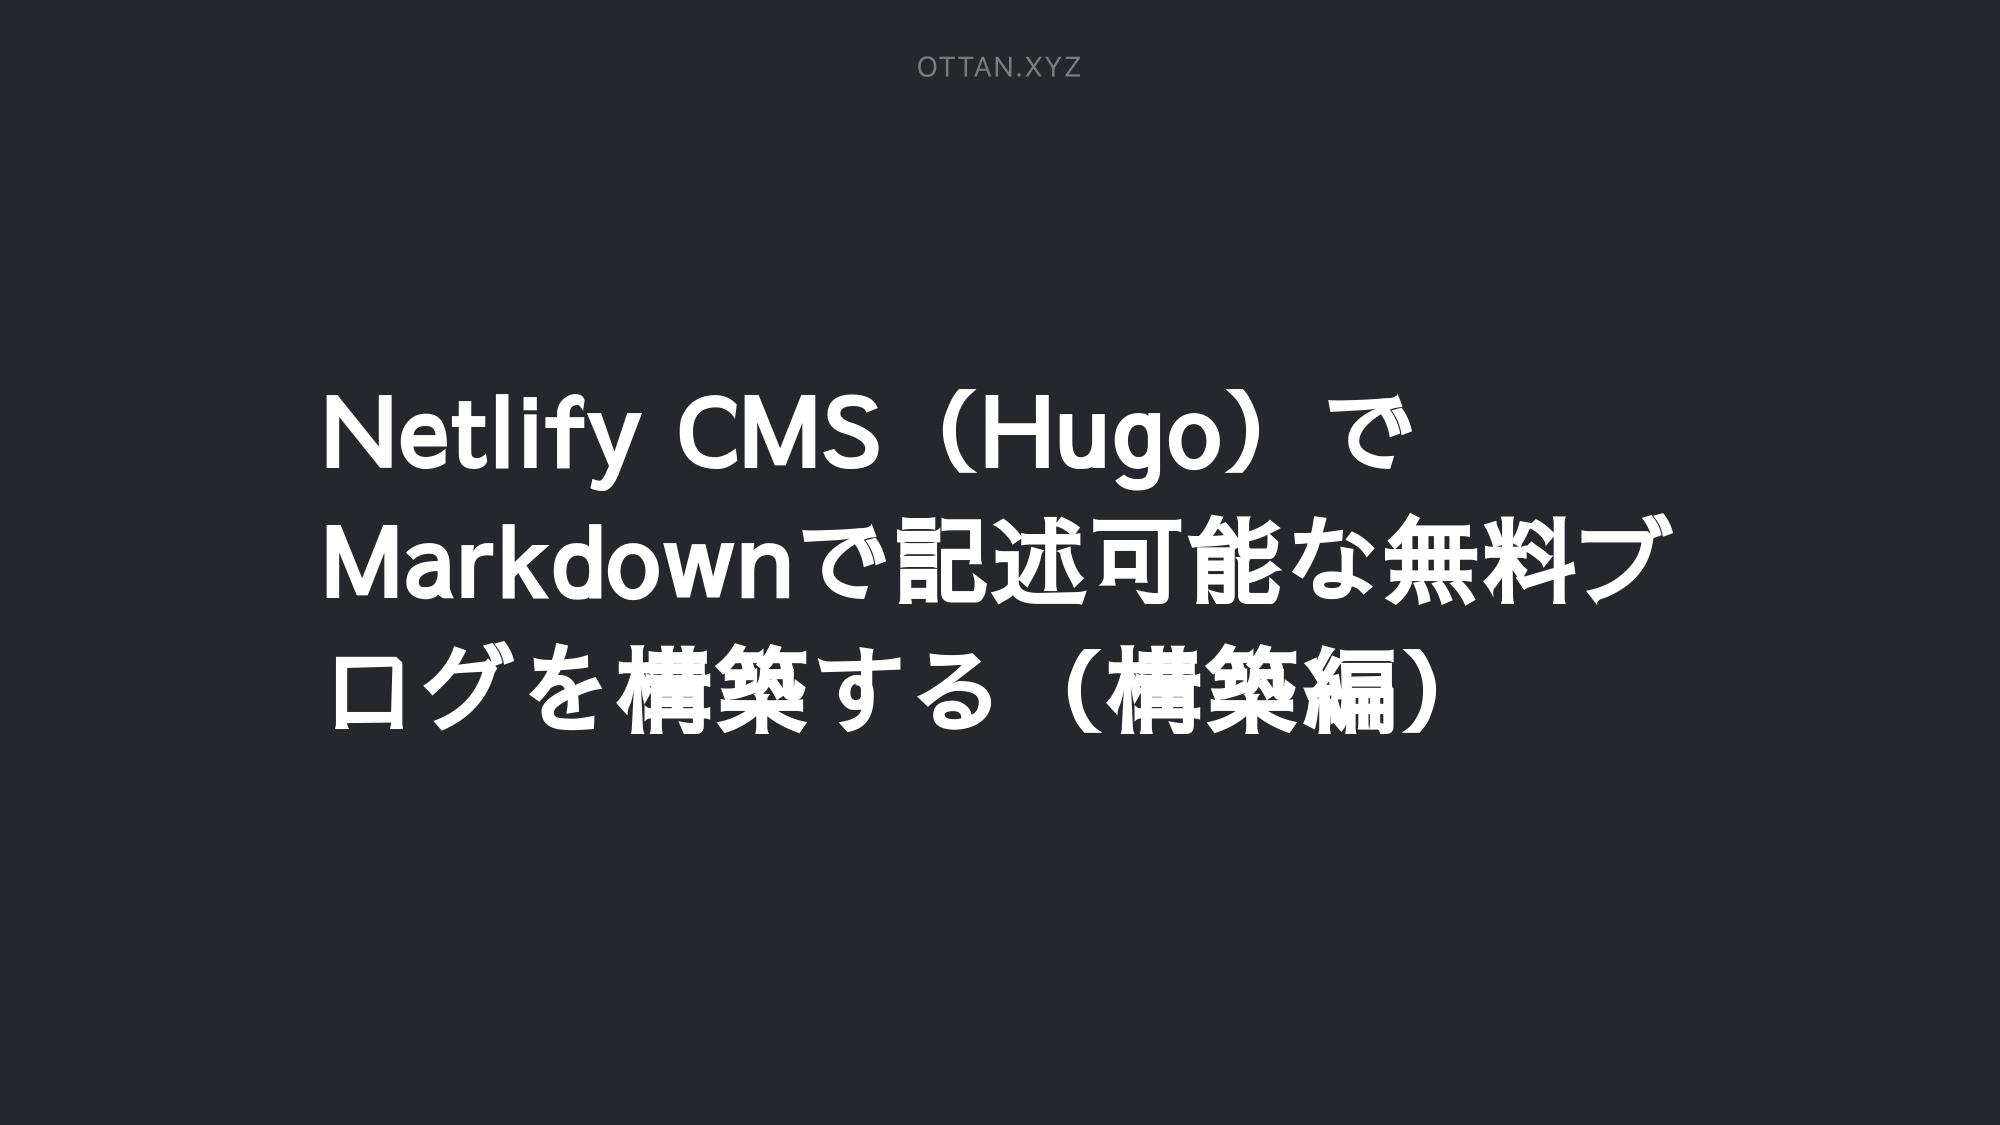 Netlify CMS(Hugo)でMarkdownで記述可能な無料ブログを構築する(構築編)